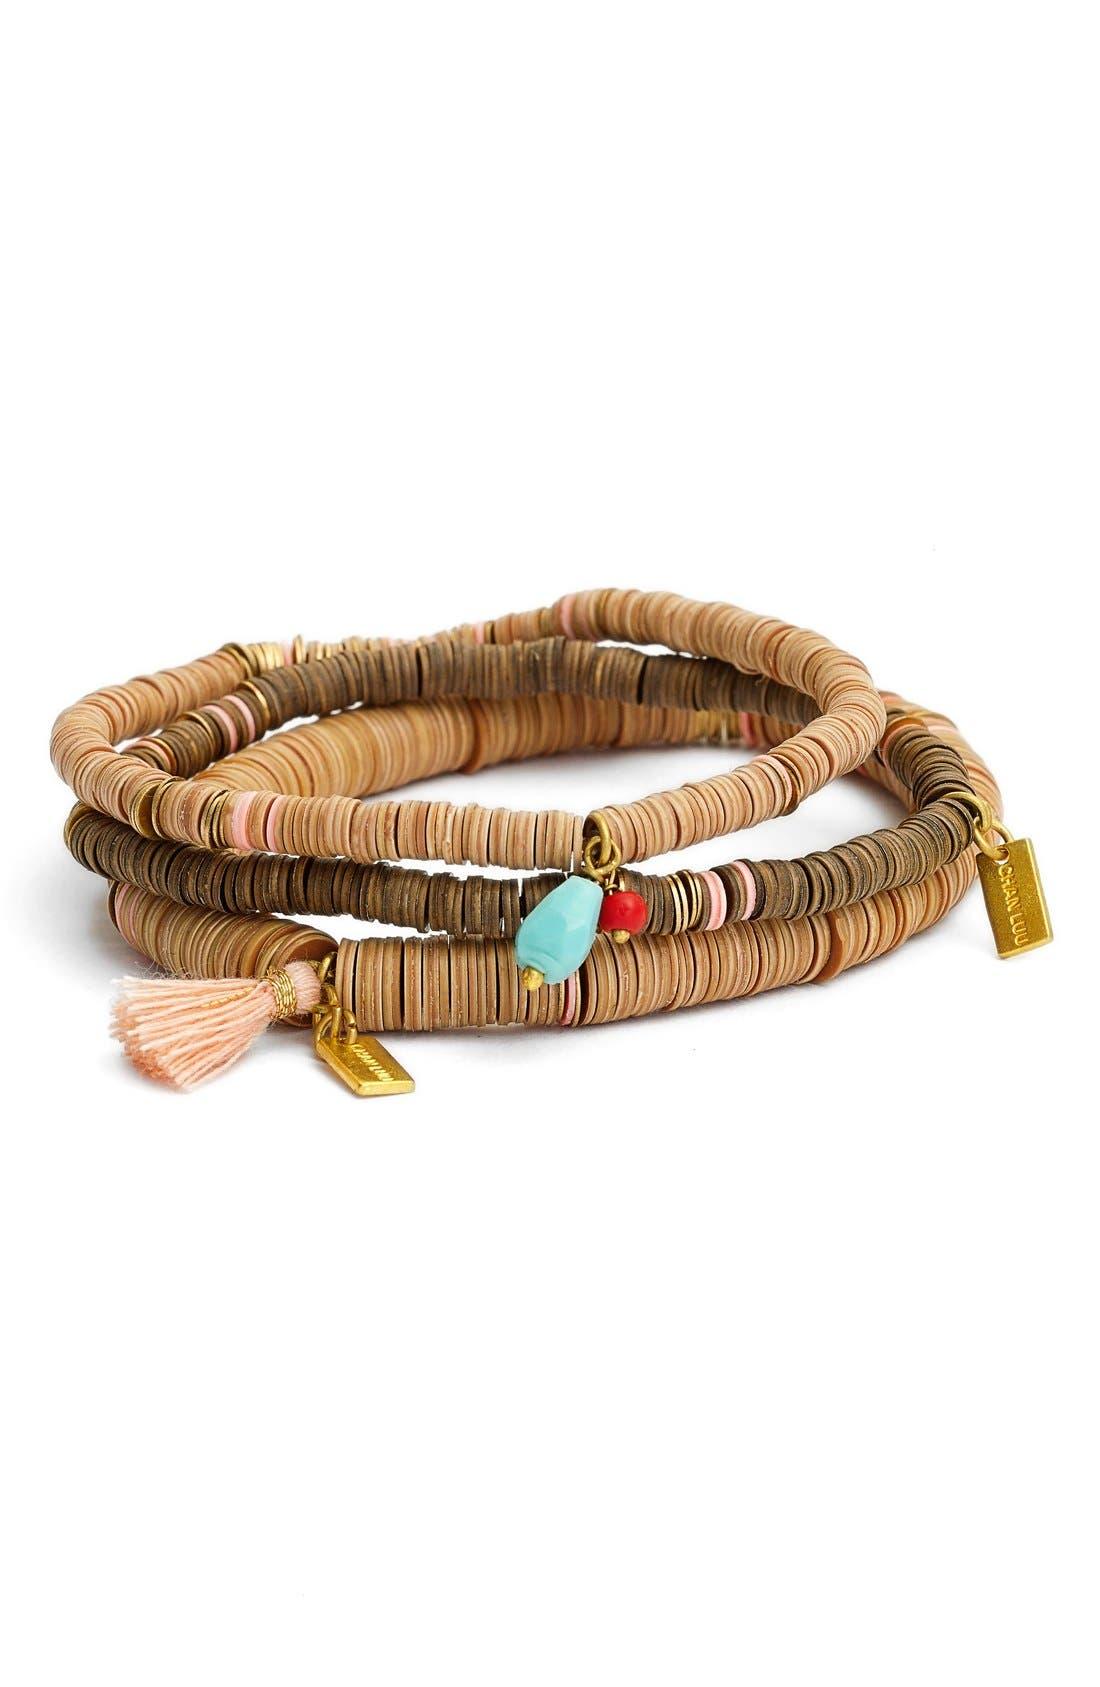 Main Image - Chan Luu Bead Stretch Bracelets (Set of 3)